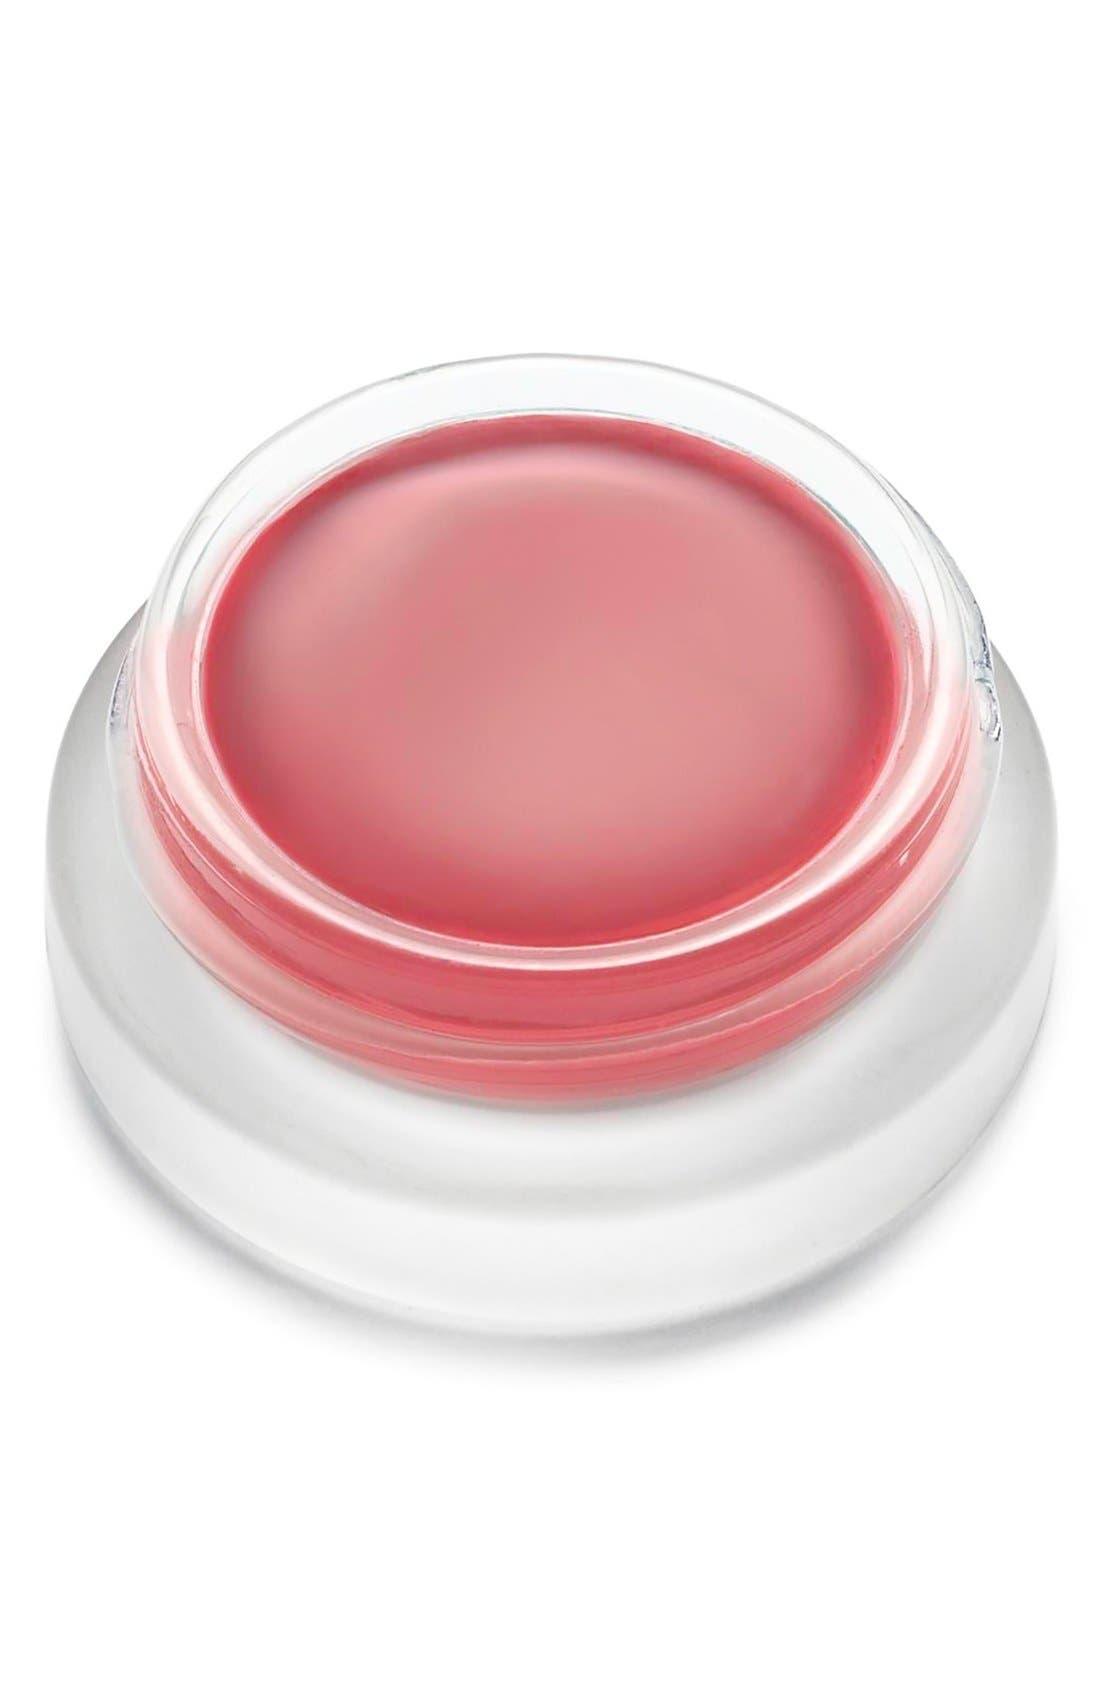 RMS Beauty Lip2Cheek Lip & Cheek Color